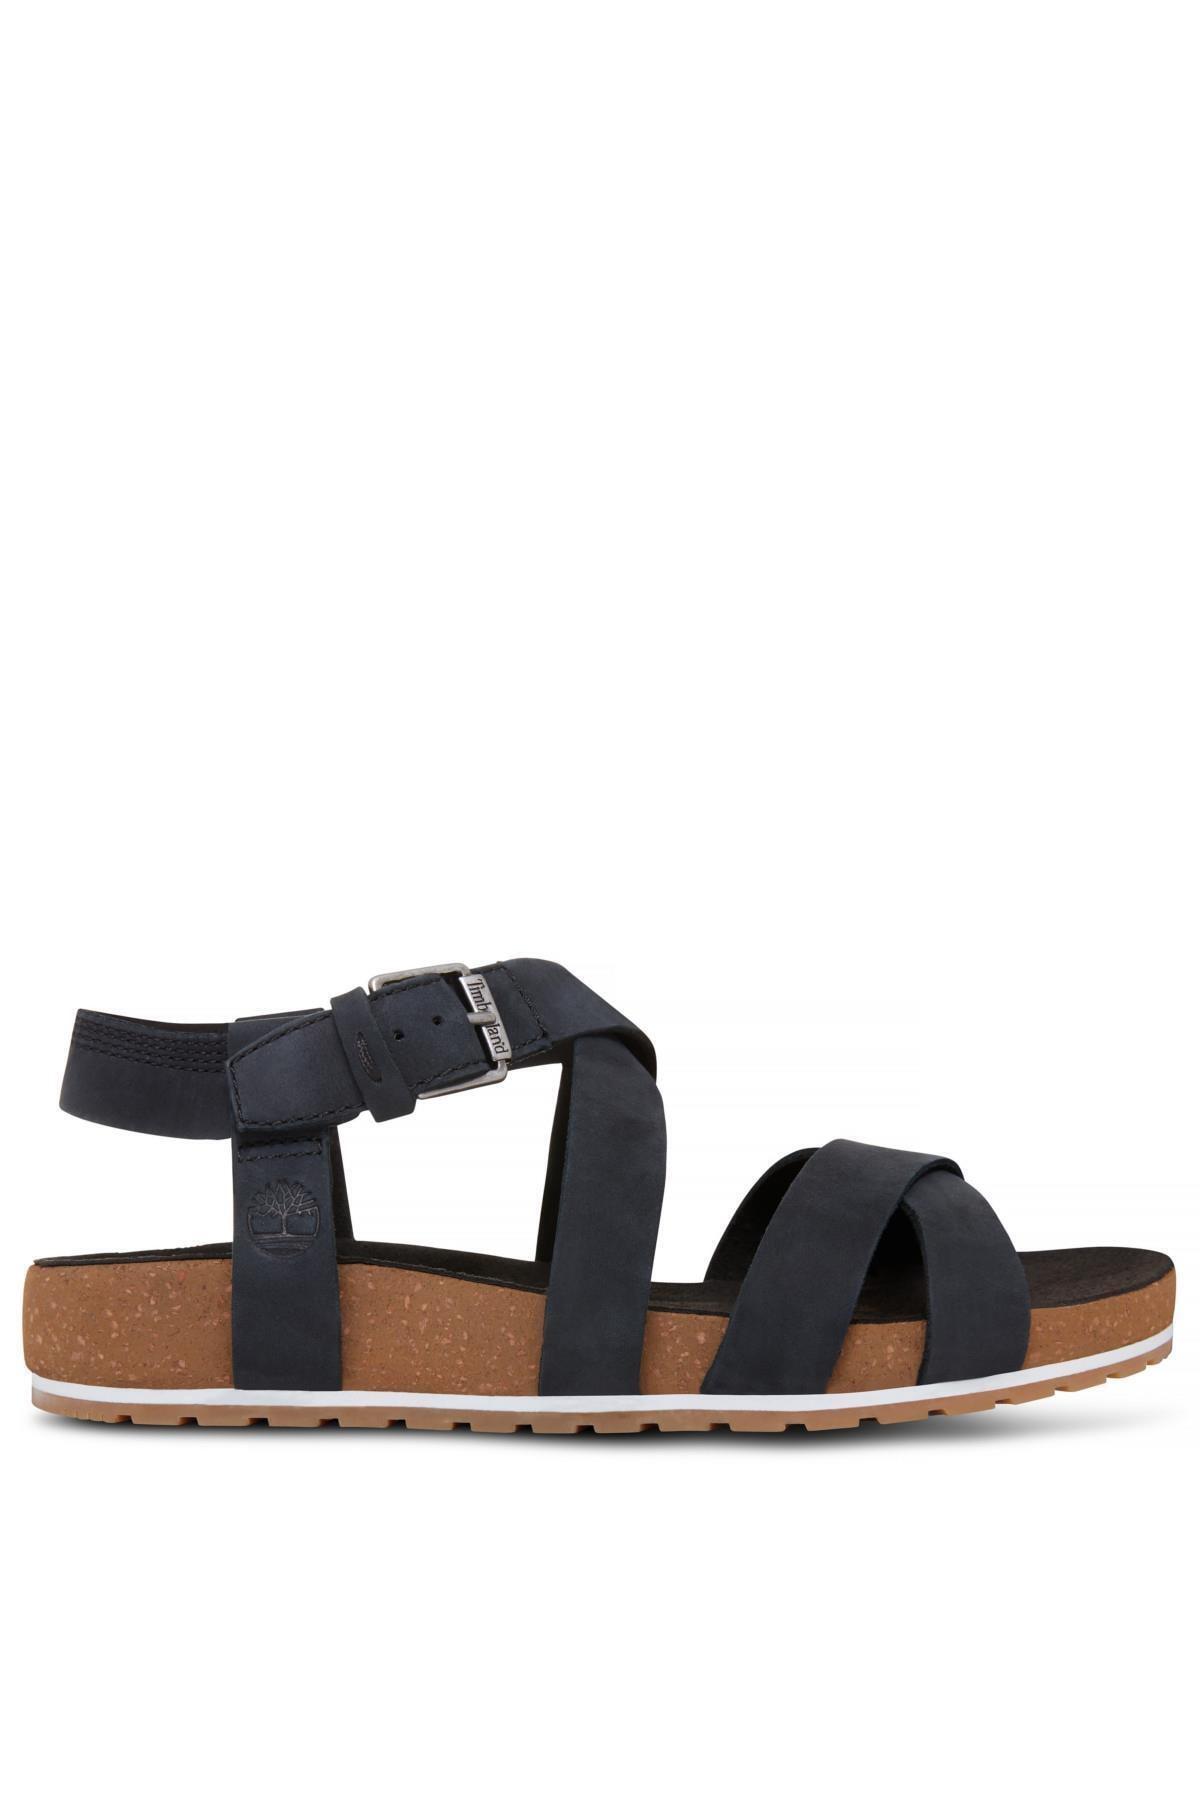 Timberland Malibu Waves Ankle Kadın Sandalet 1